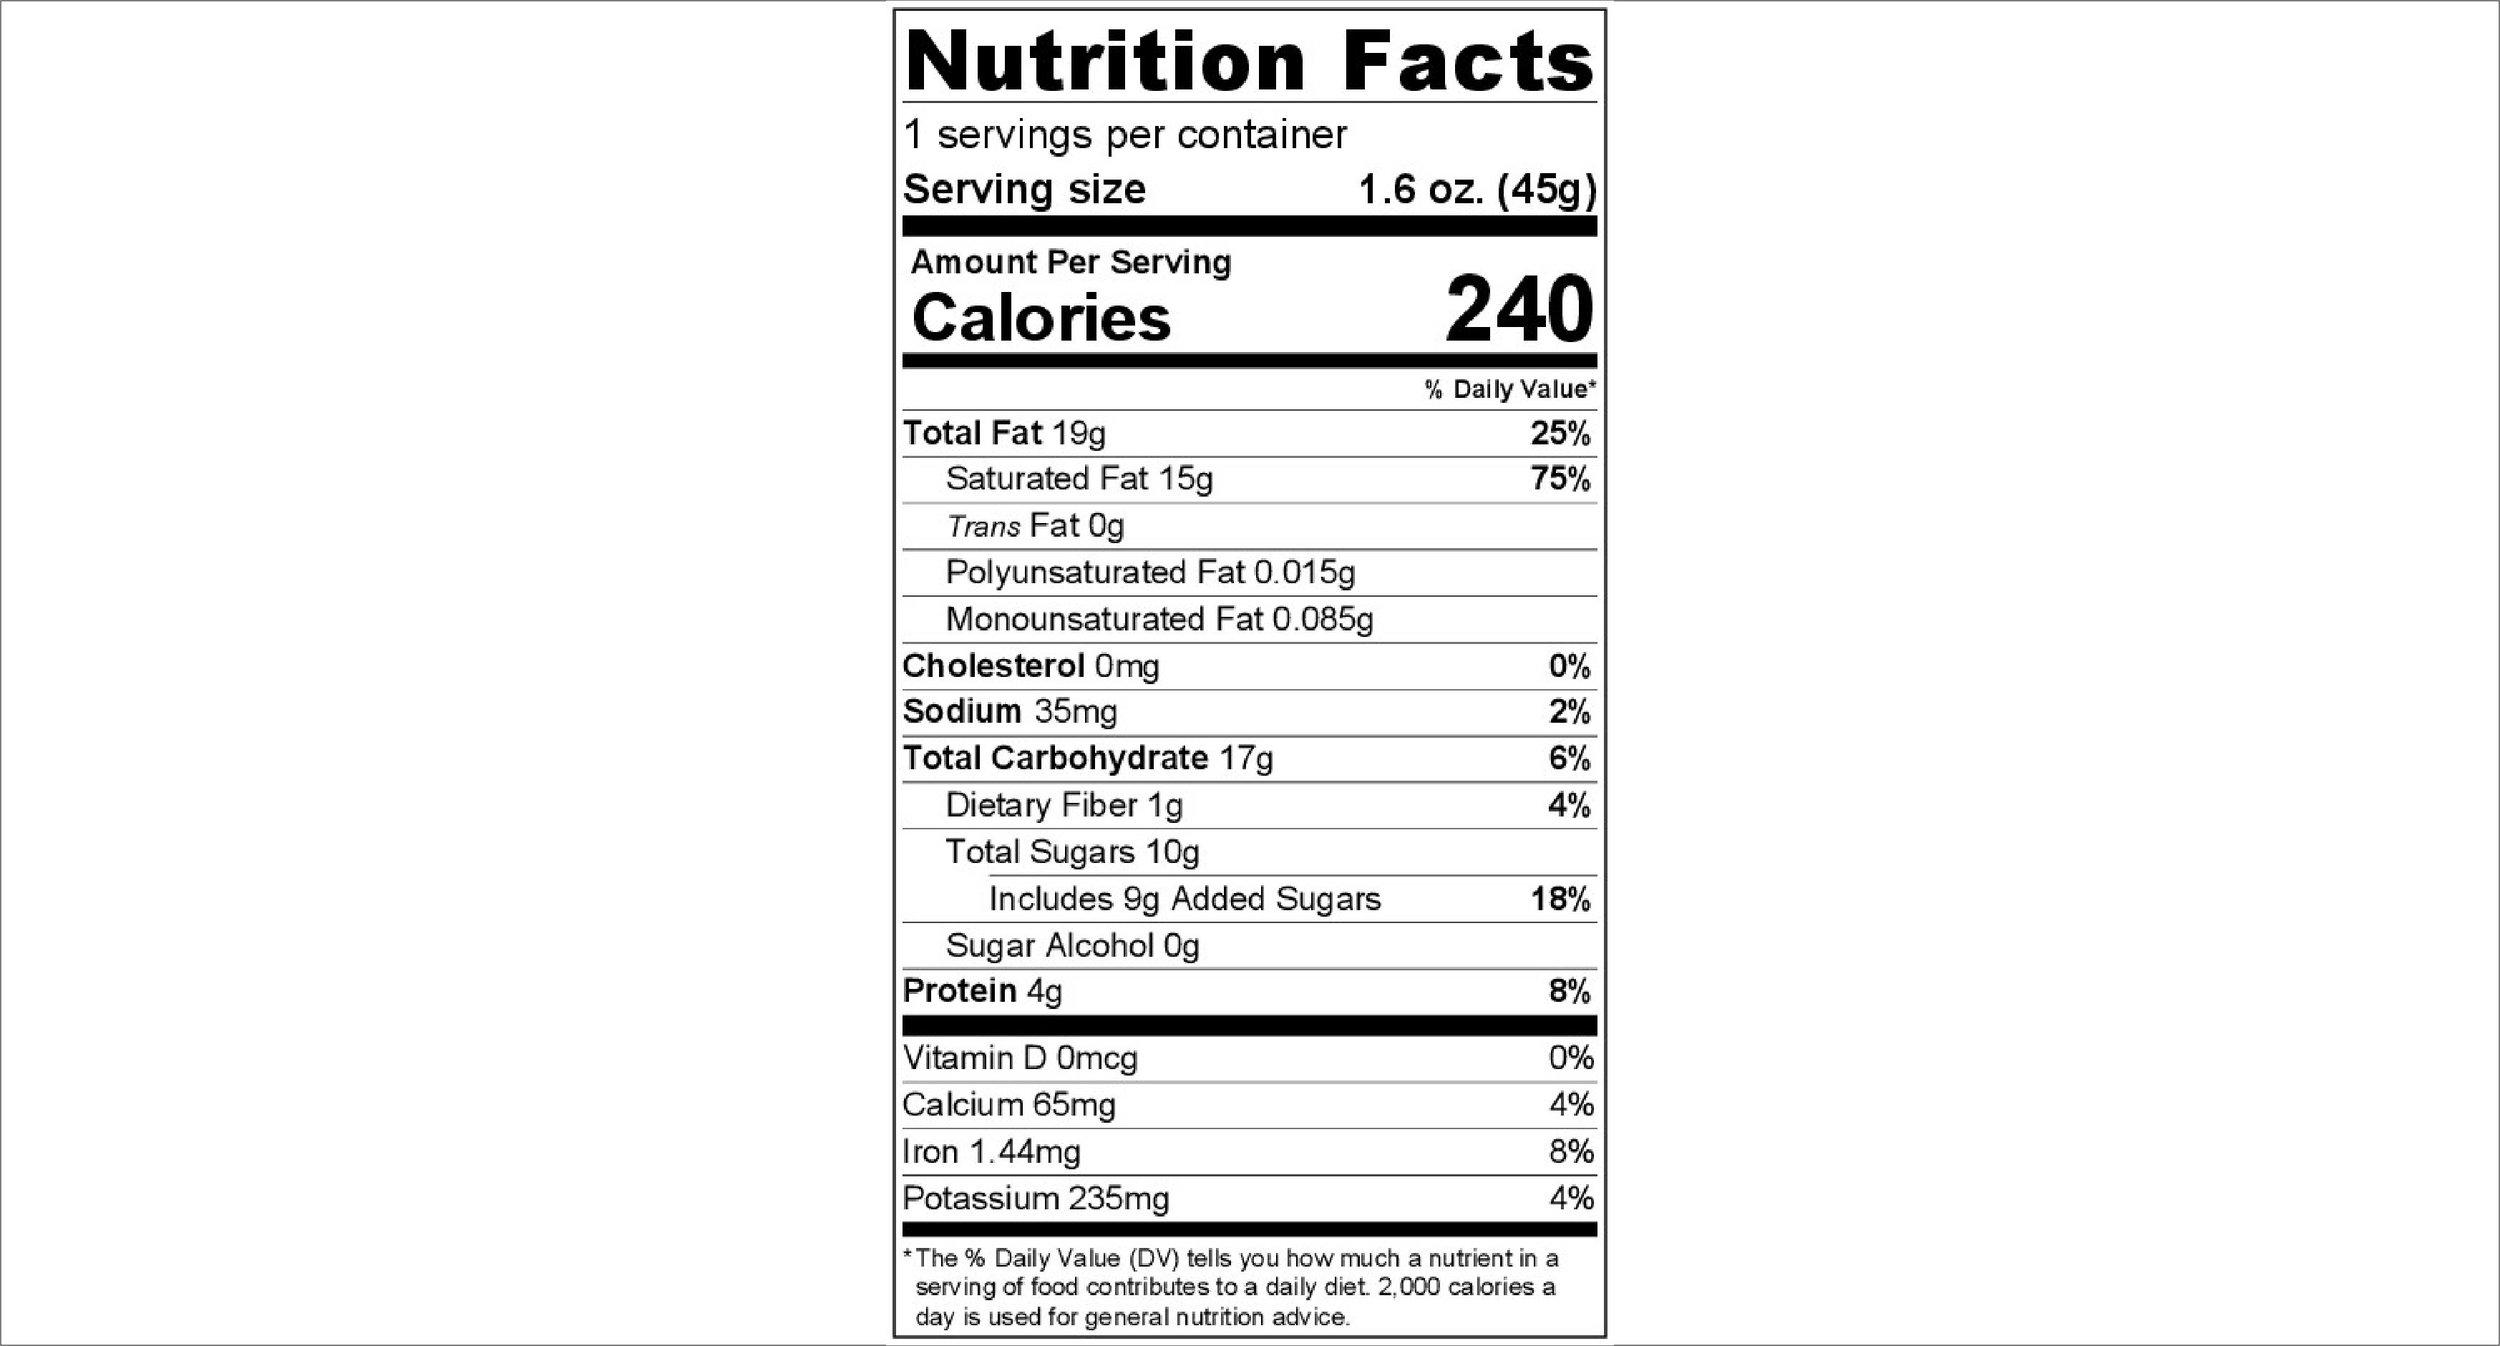 pumpkinspicenutritionfacts.jpg